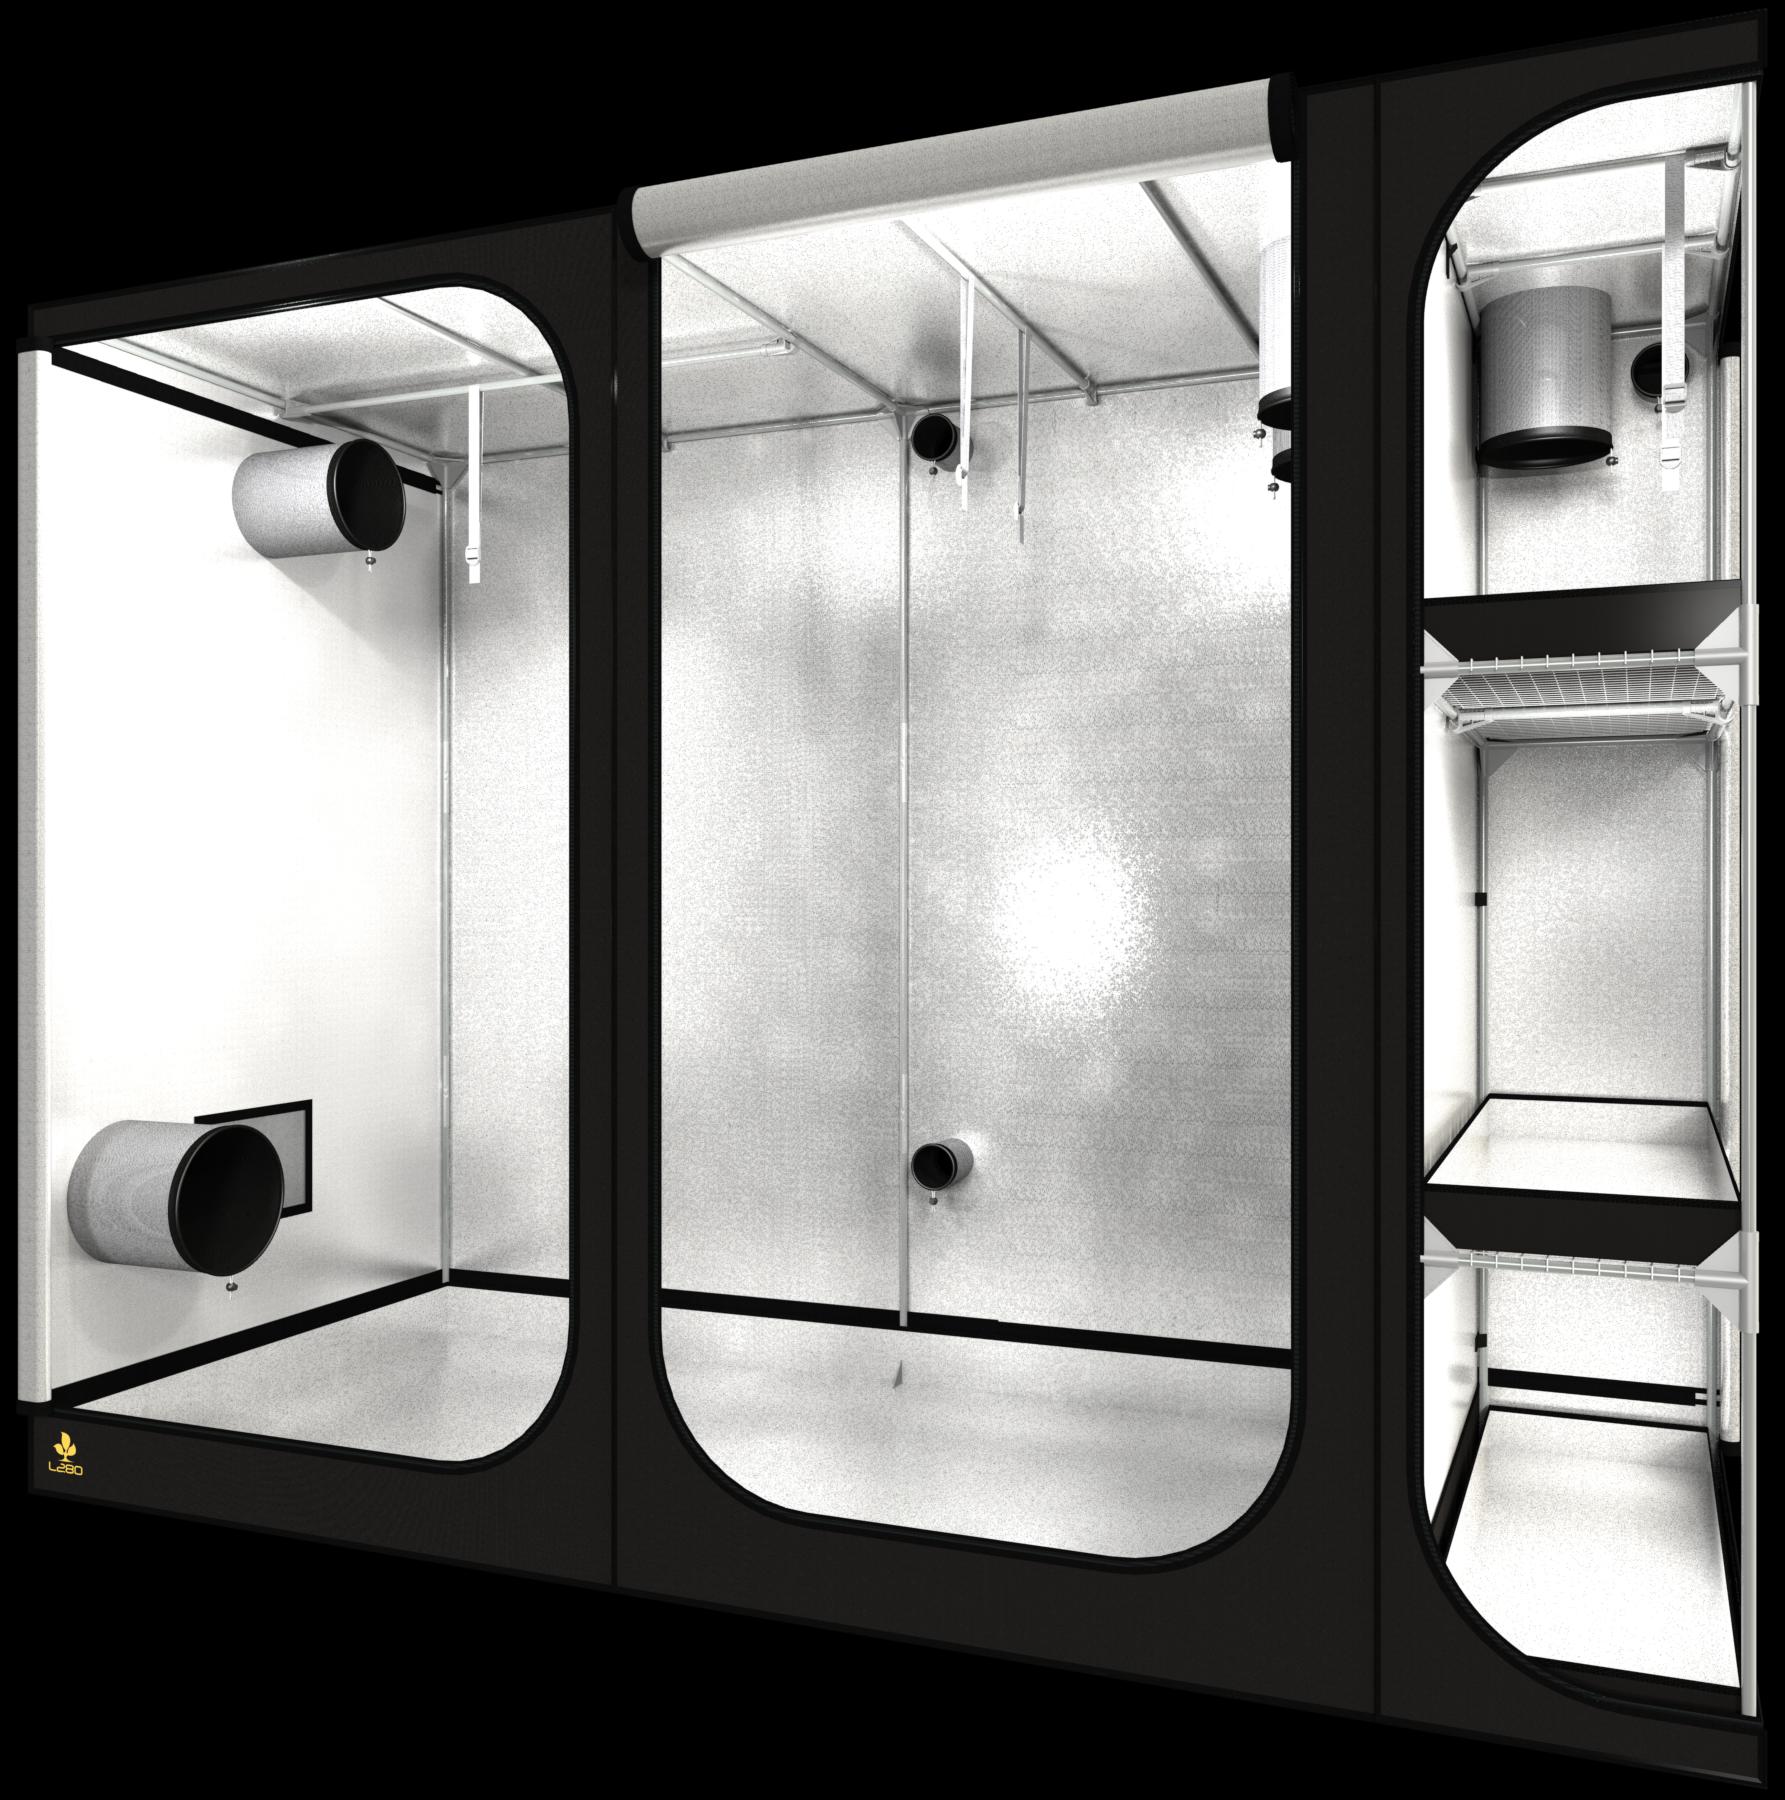 Dark room Lodge L280 REV 2,5 280X120X210cm (280X120X210cm)